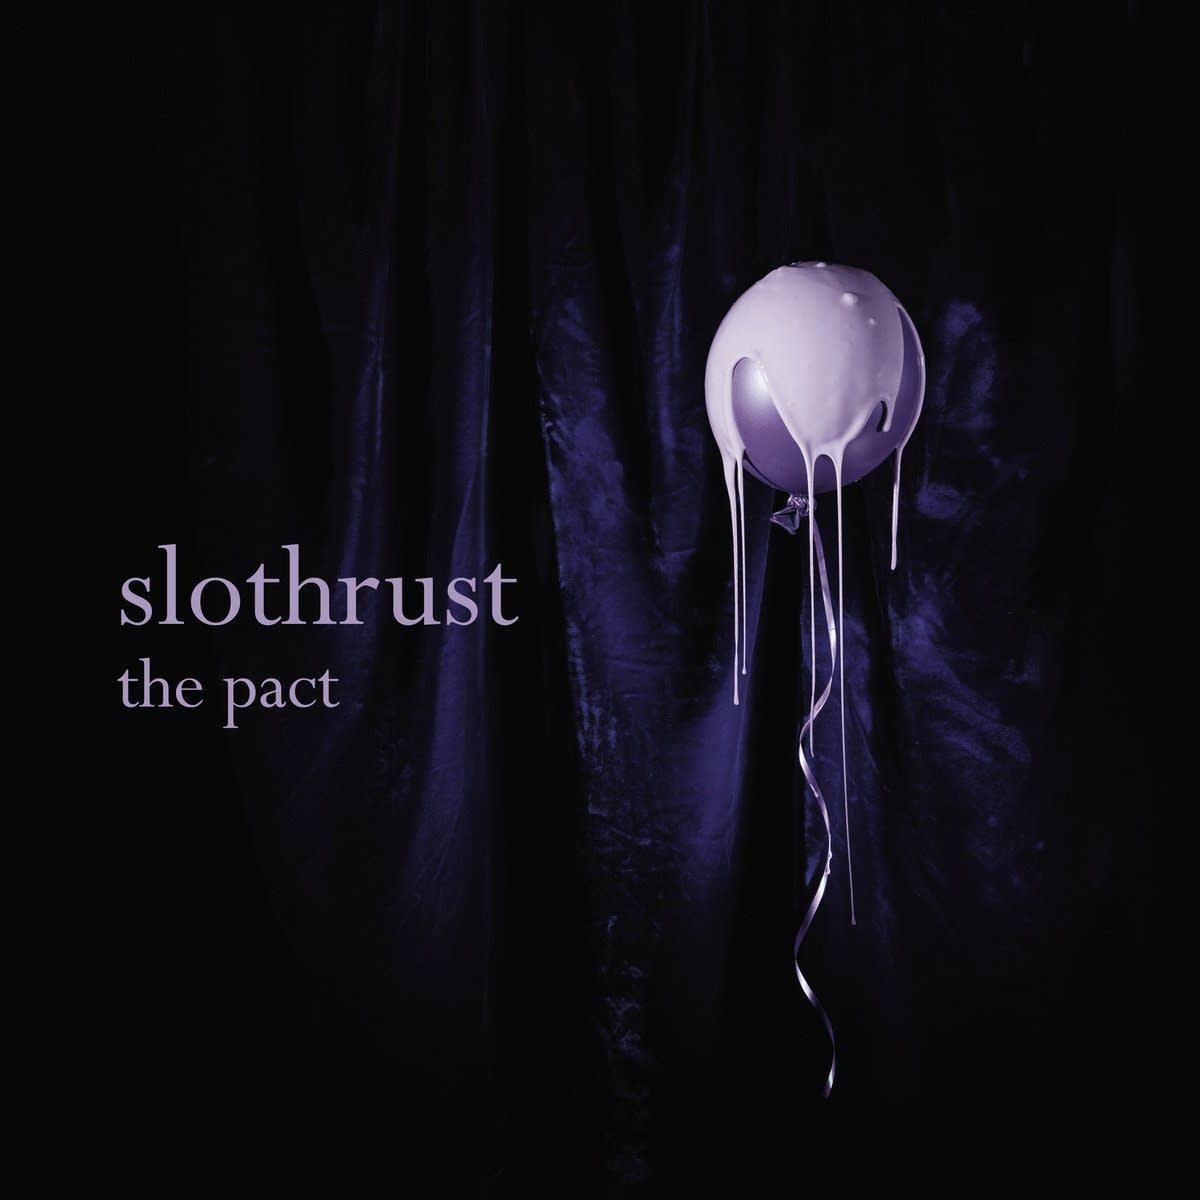 Slothrust